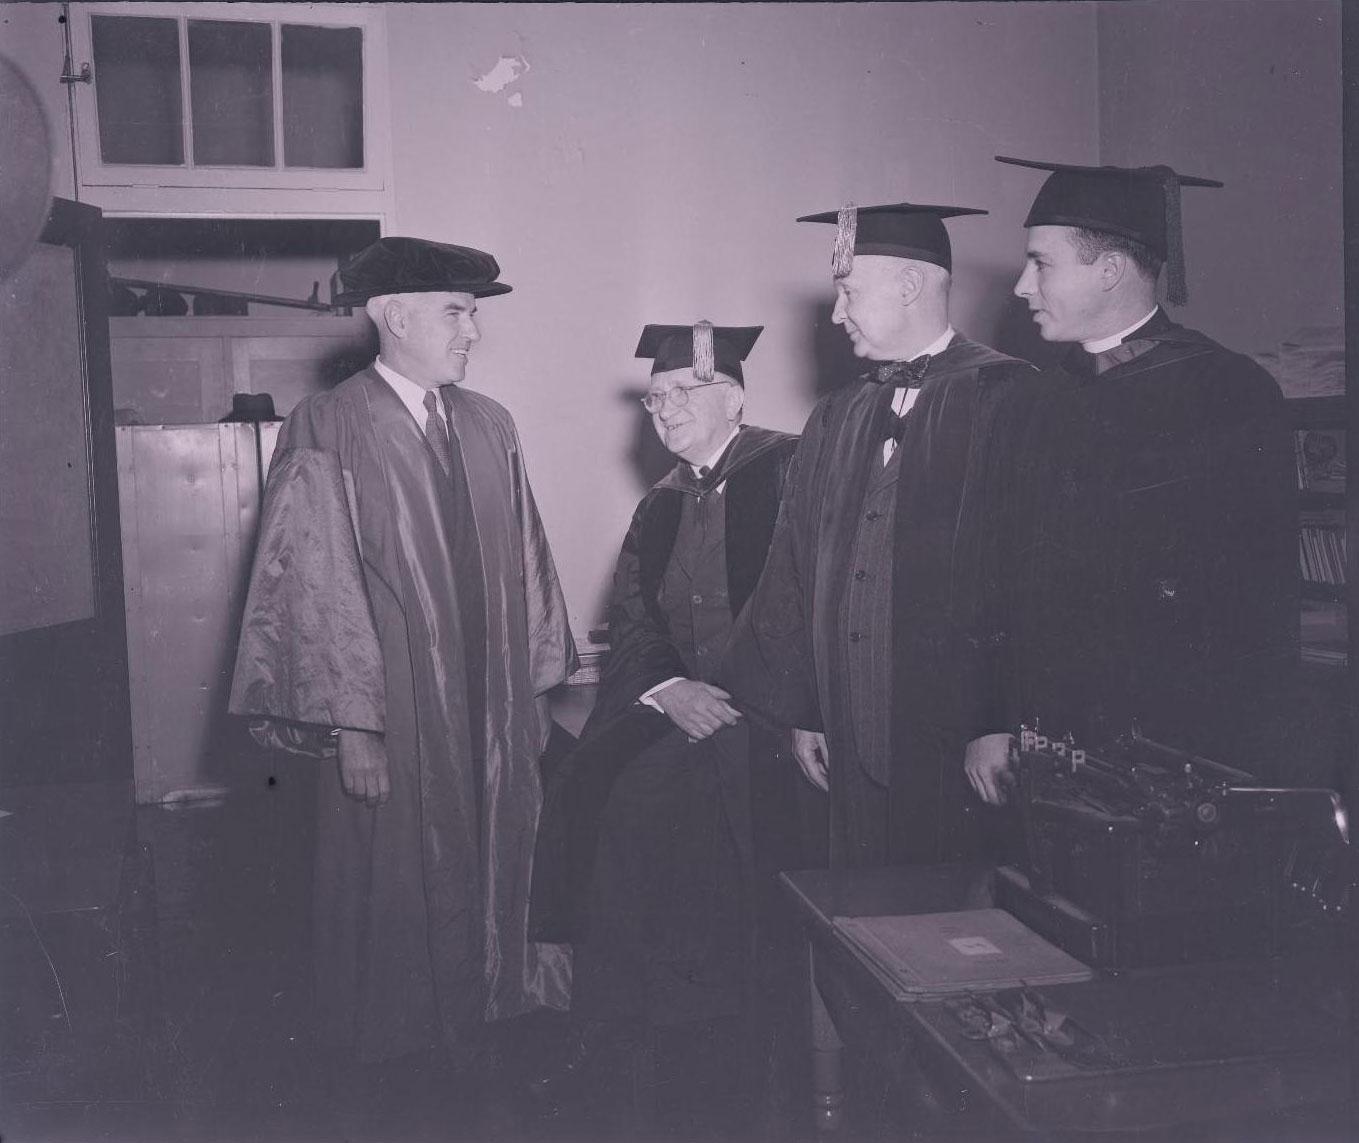 Rector Stettinius, left, in academic regalia on the Grounds at UVA.